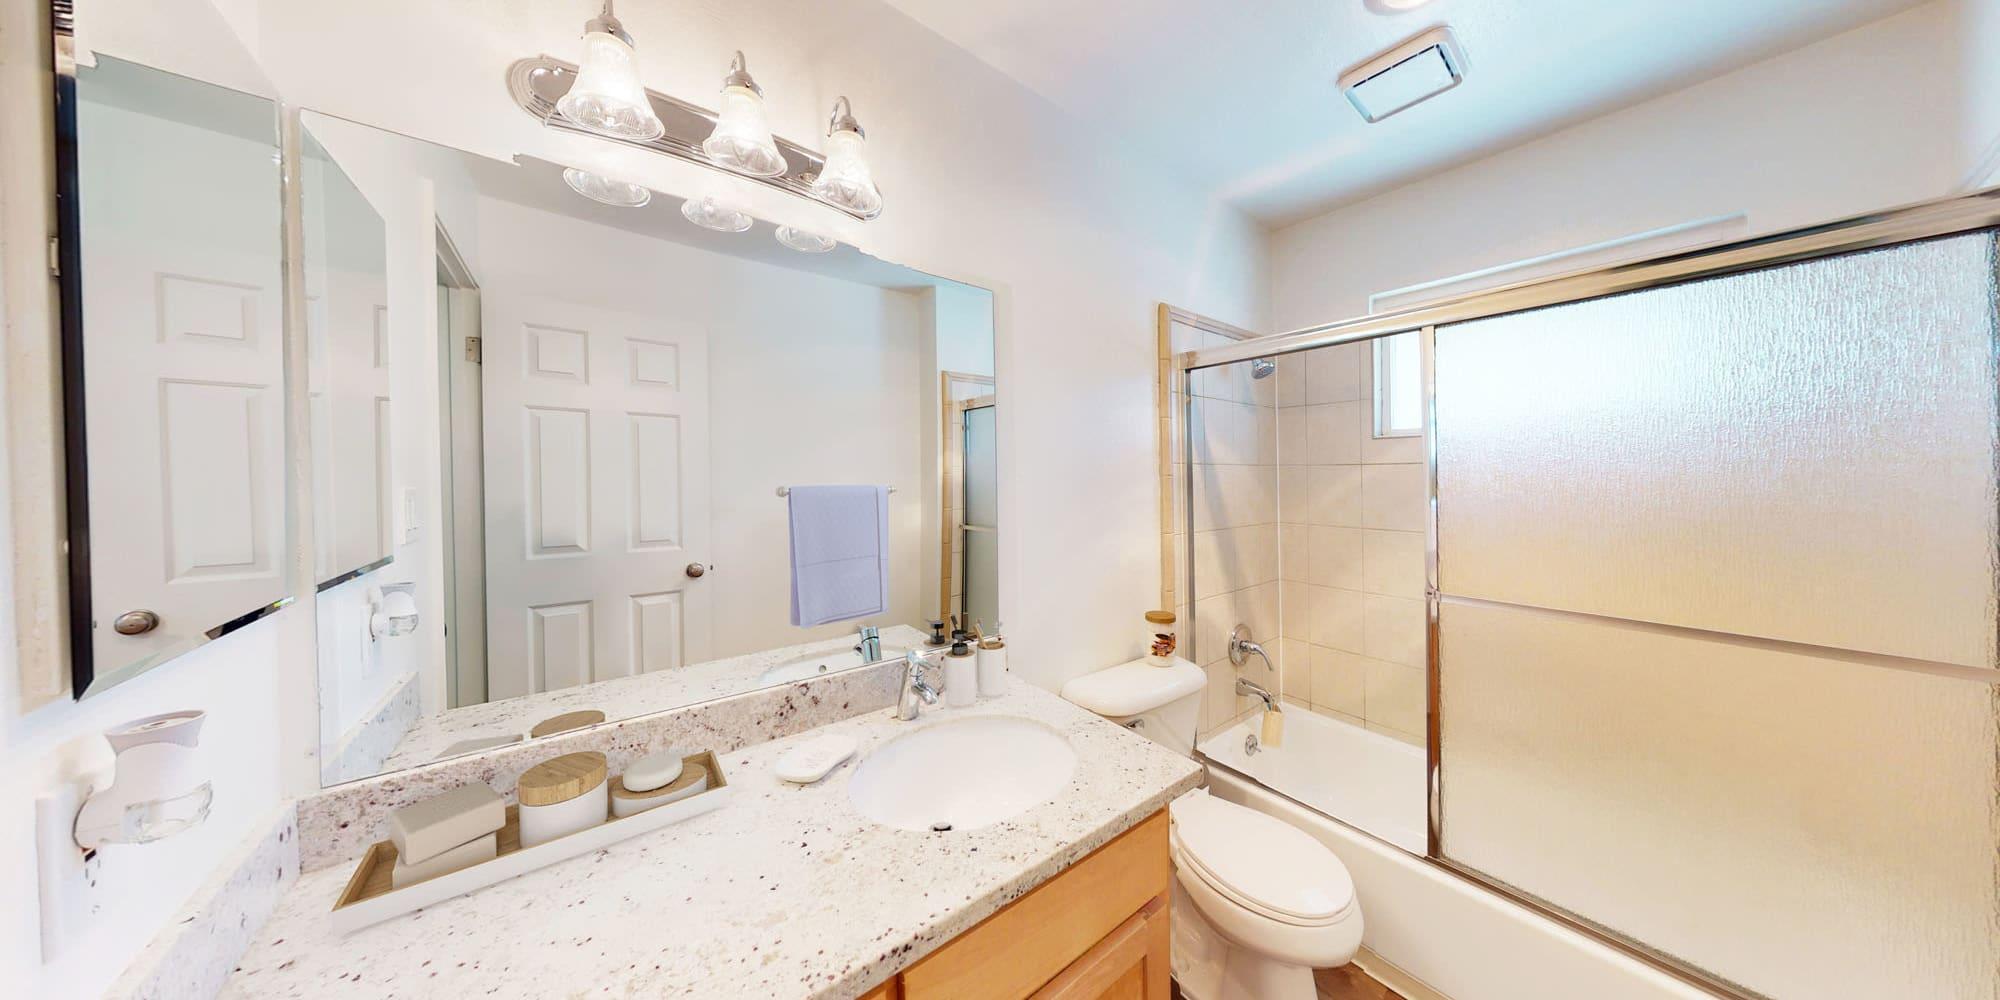 Large vanity mirror in a model apartment's well-lit primary bathroom at Pleasanton Glen Apartment Homes in Pleasanton, California